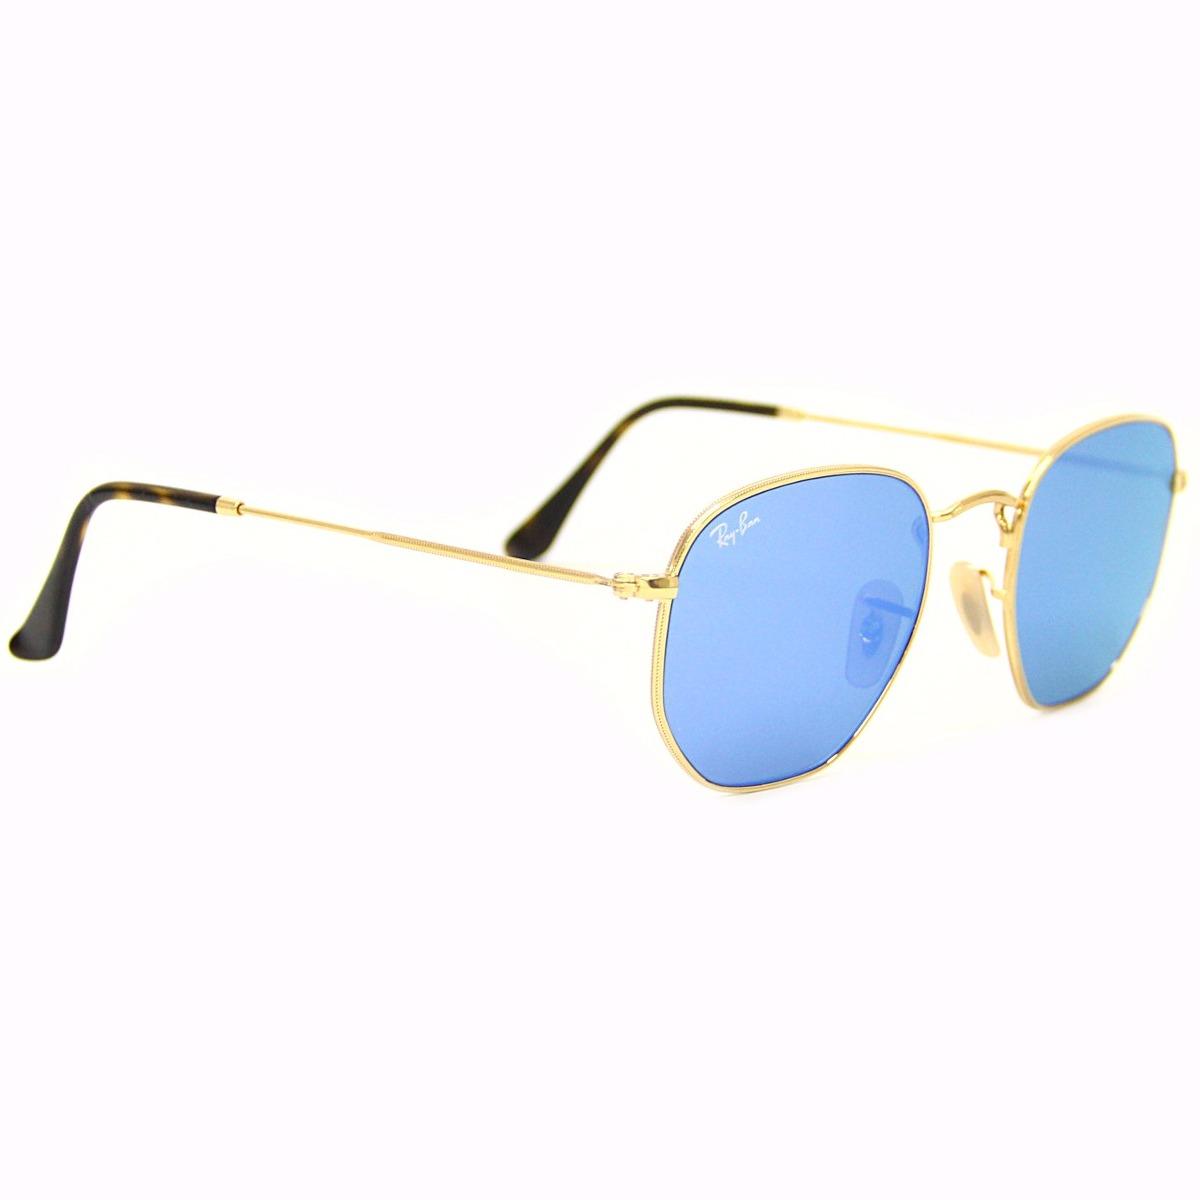 30b7e4a345b01 Óculos Sol Ray Ban 3548 Hexa Original + Limpa Lentes - R  449,99 em ...